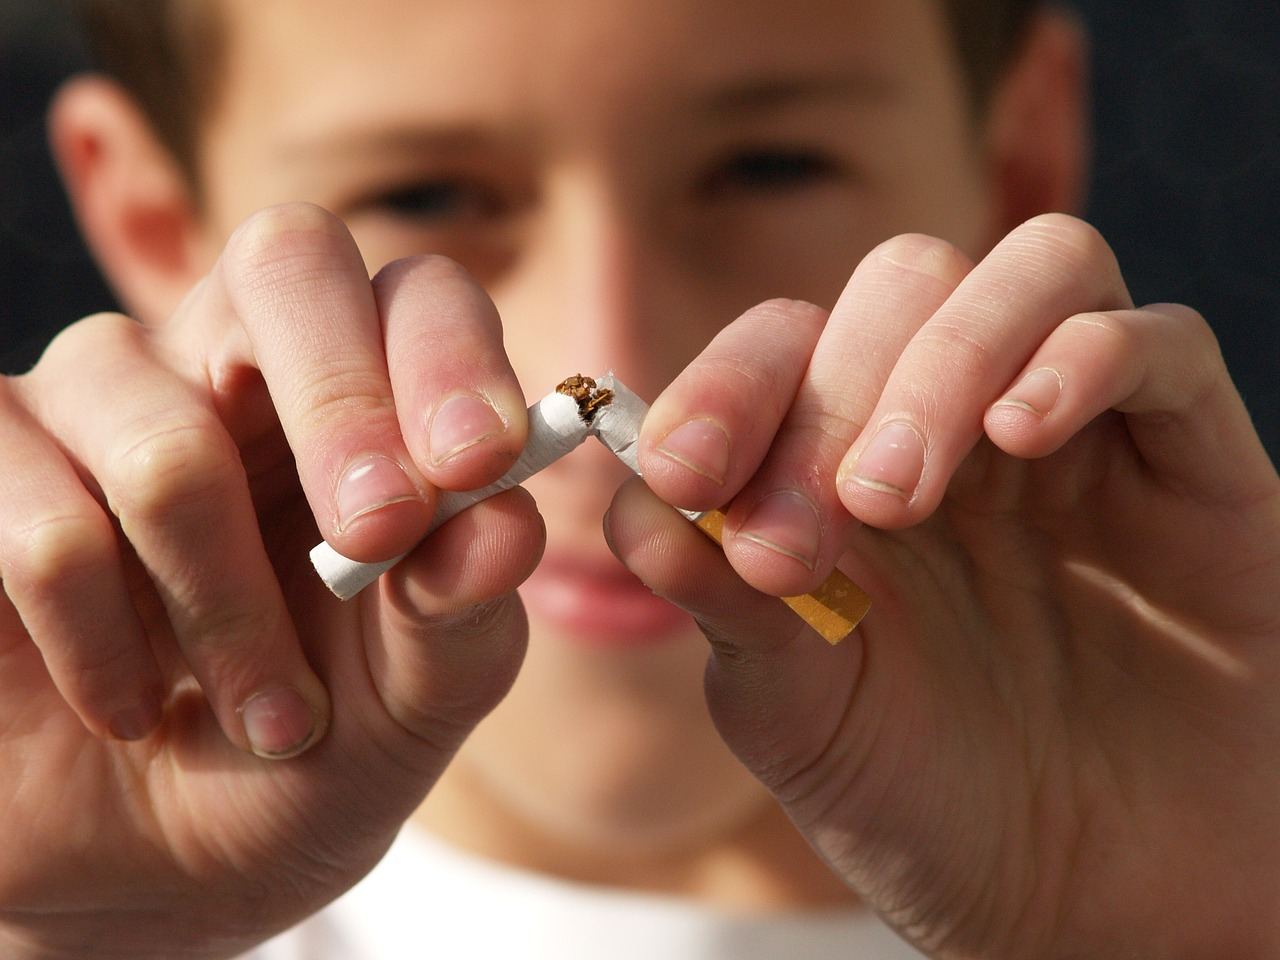 мальчик ломает сигарету